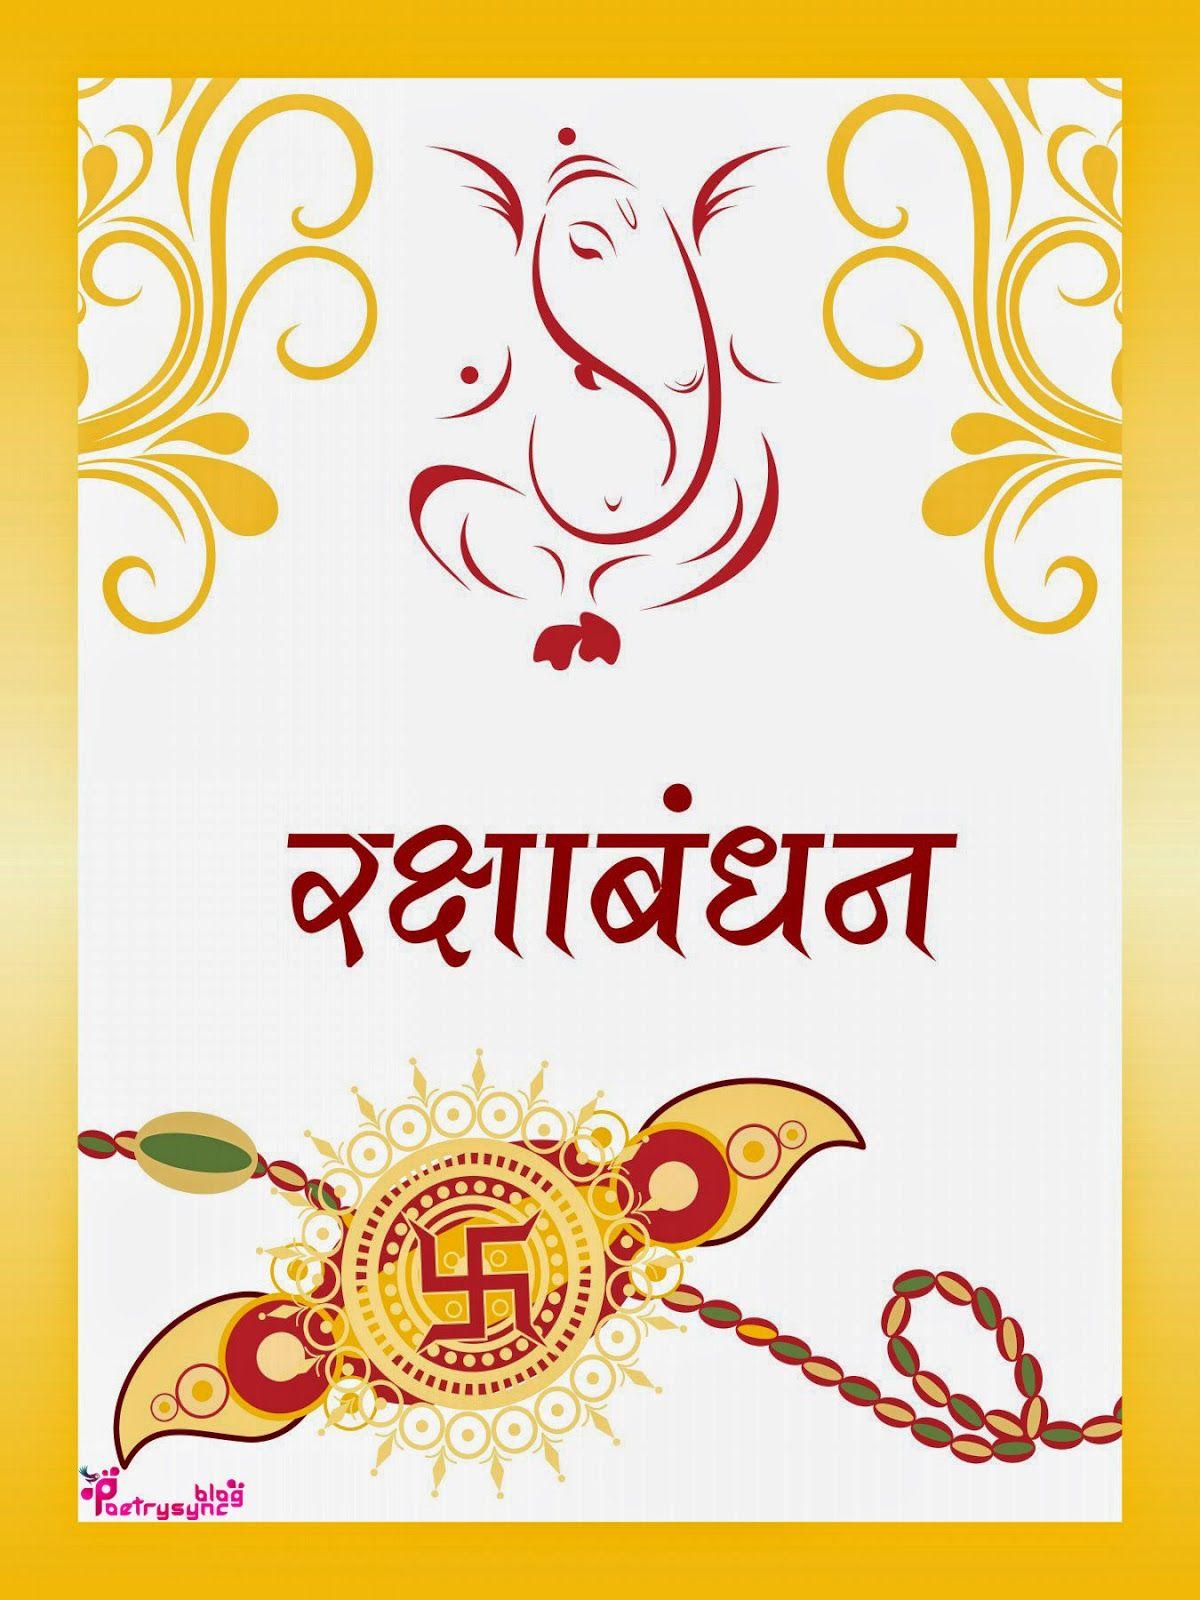 Images of raksha bandhan greeting cards 2014 poetry rakhi cards images of raksha bandhan greeting cards 2014 poetry m4hsunfo